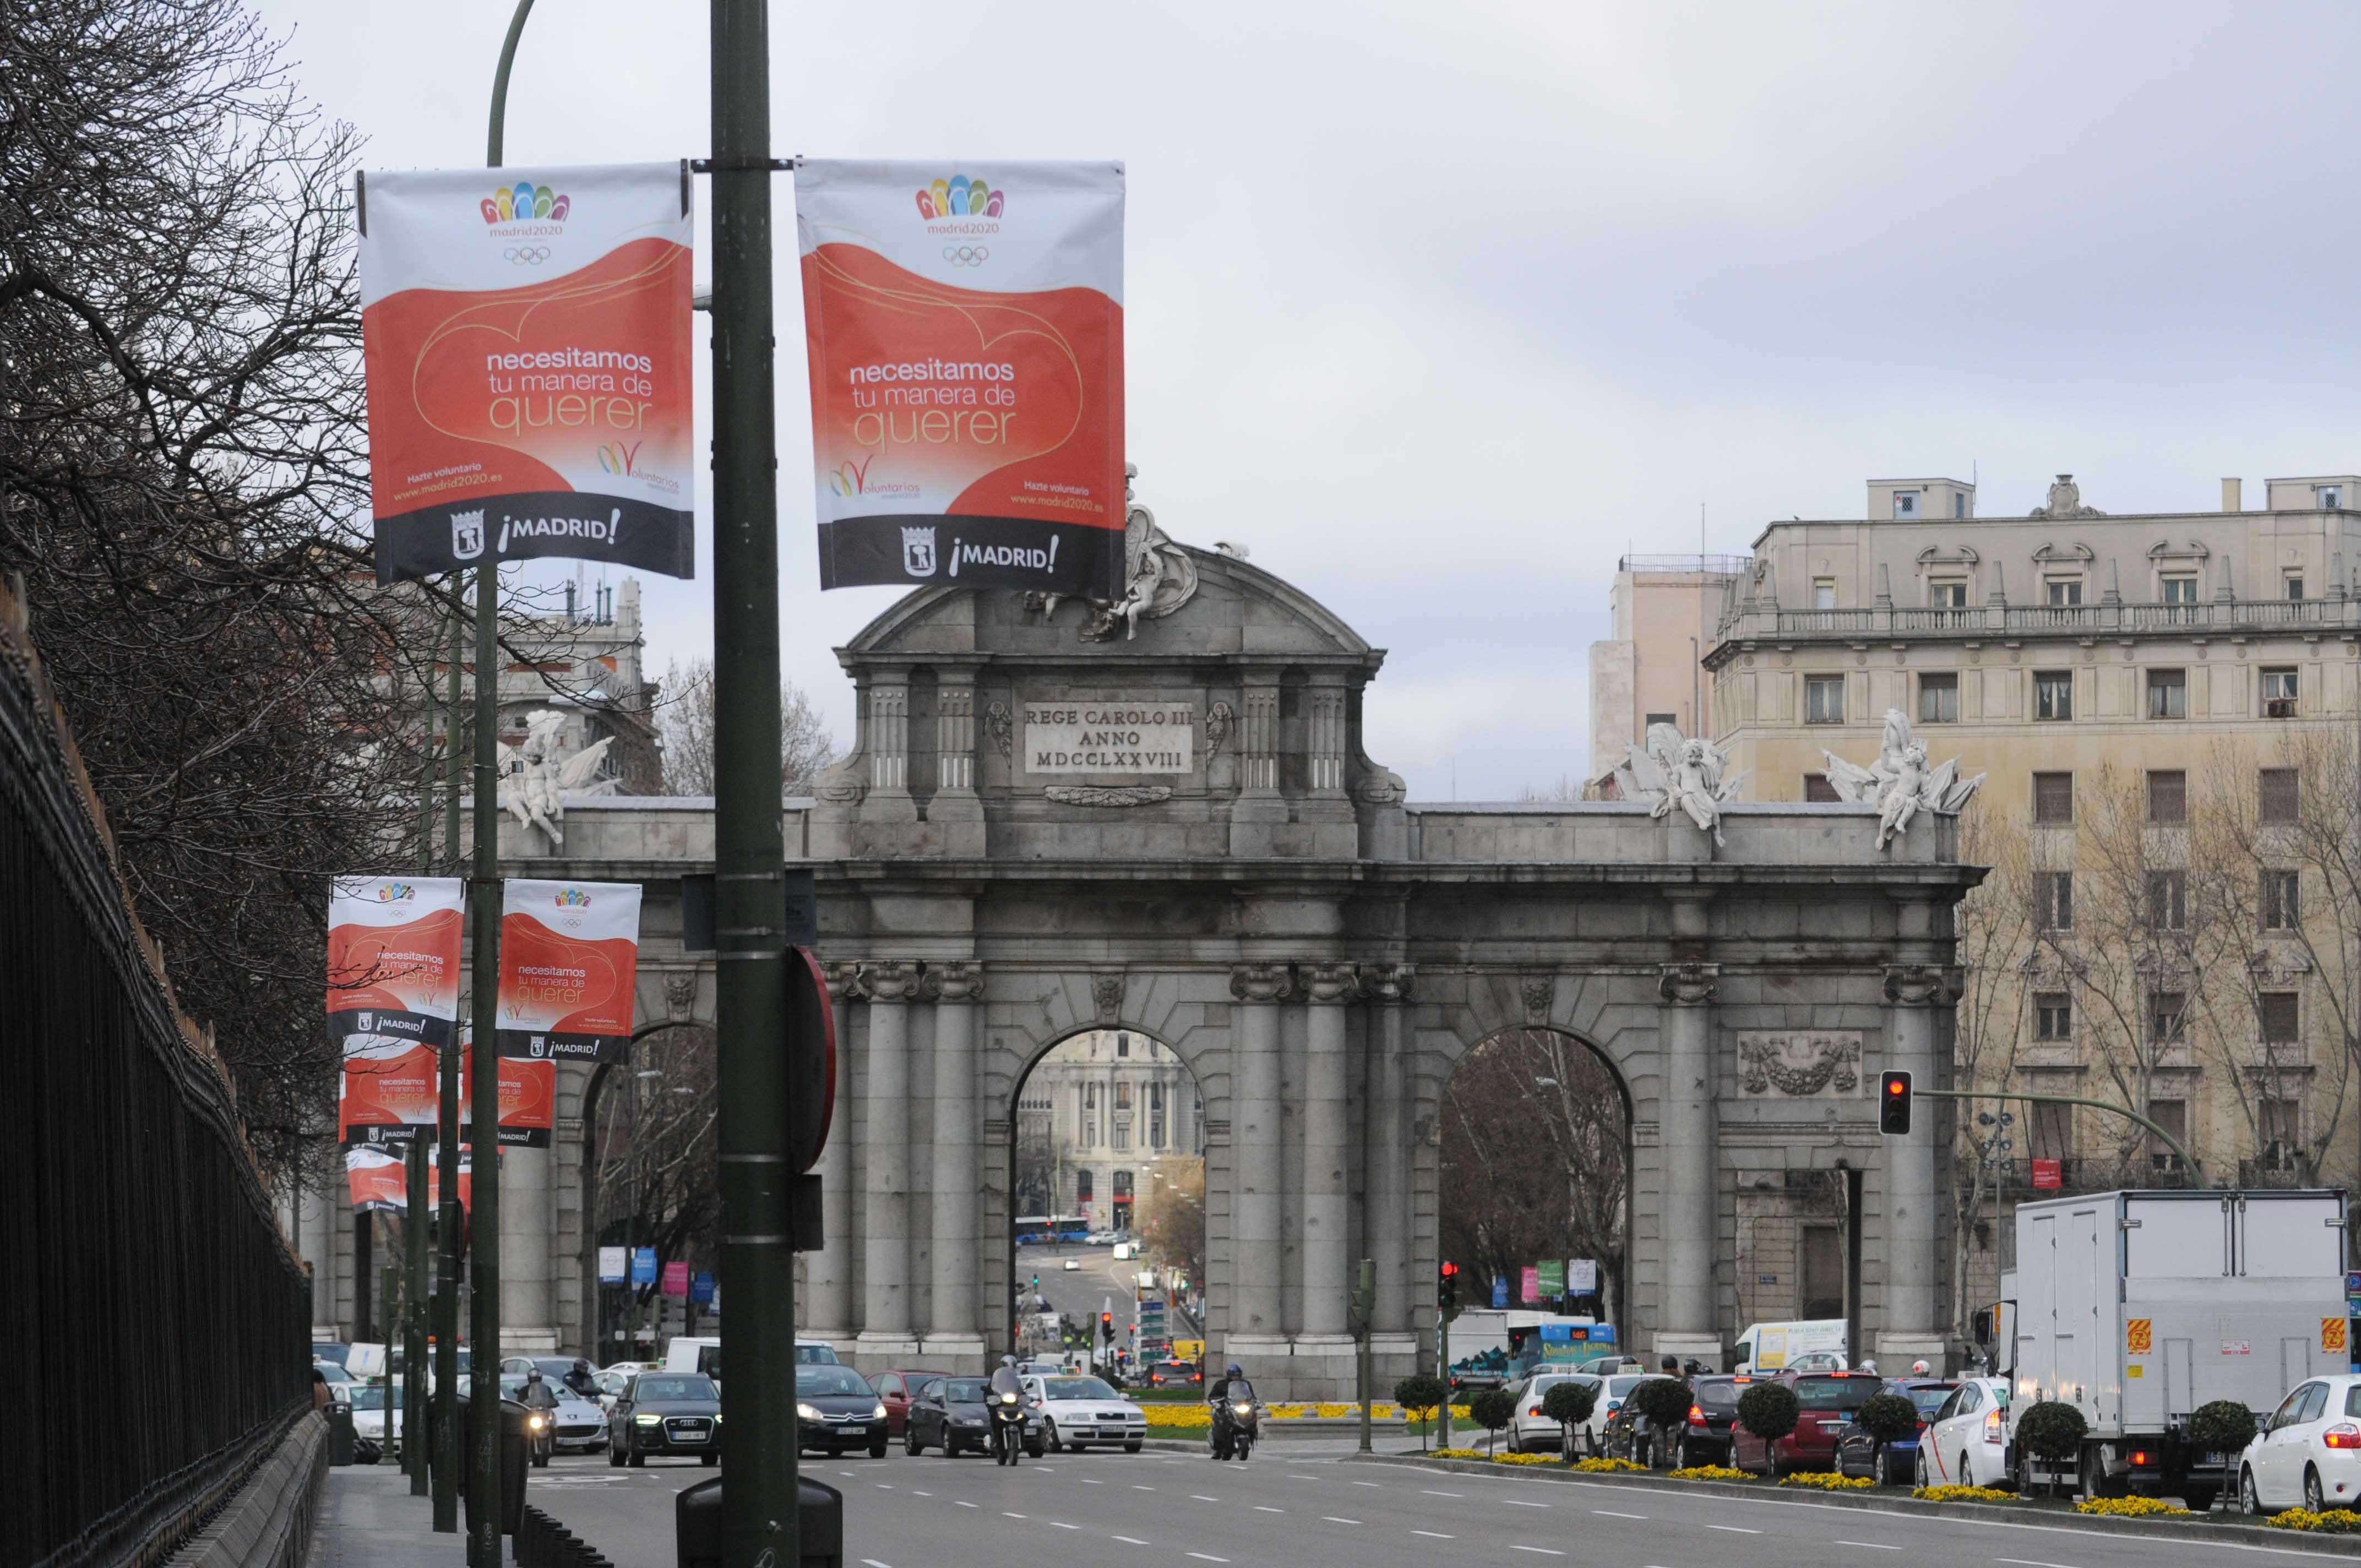 Madrid 2020 decoration of city 1